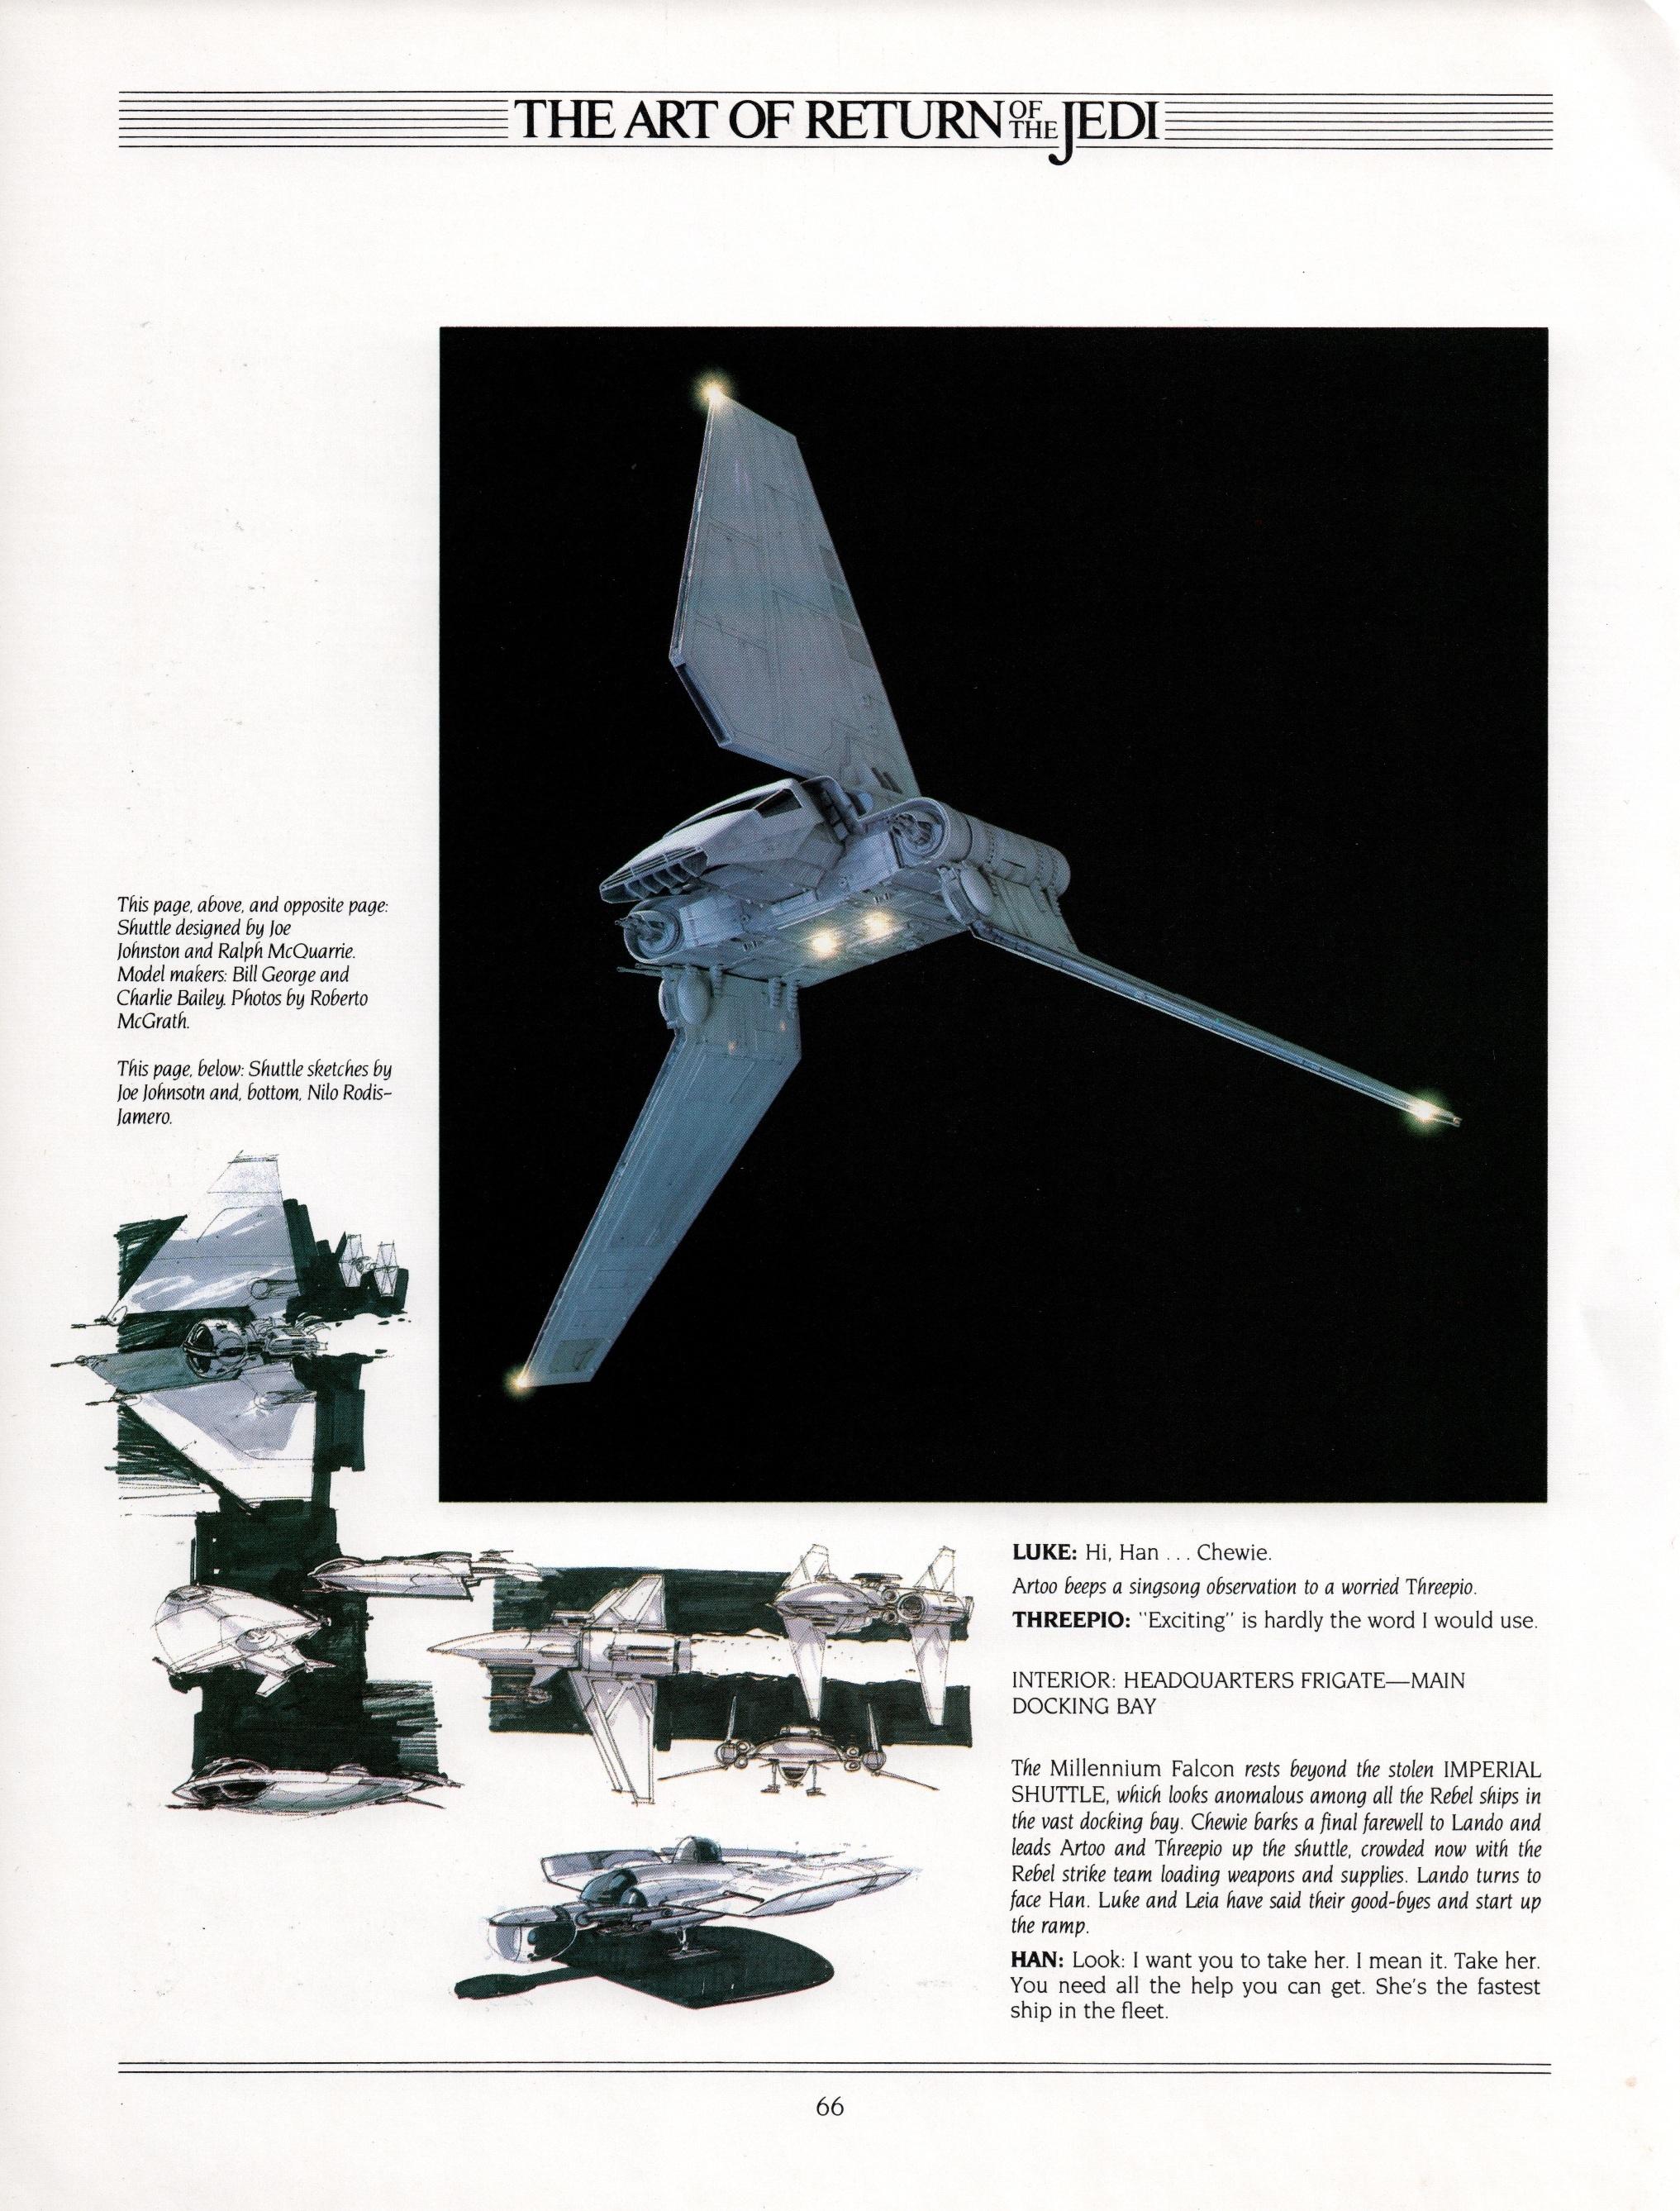 Art of Return of the Jedi (b0bafett_Empire)-p066